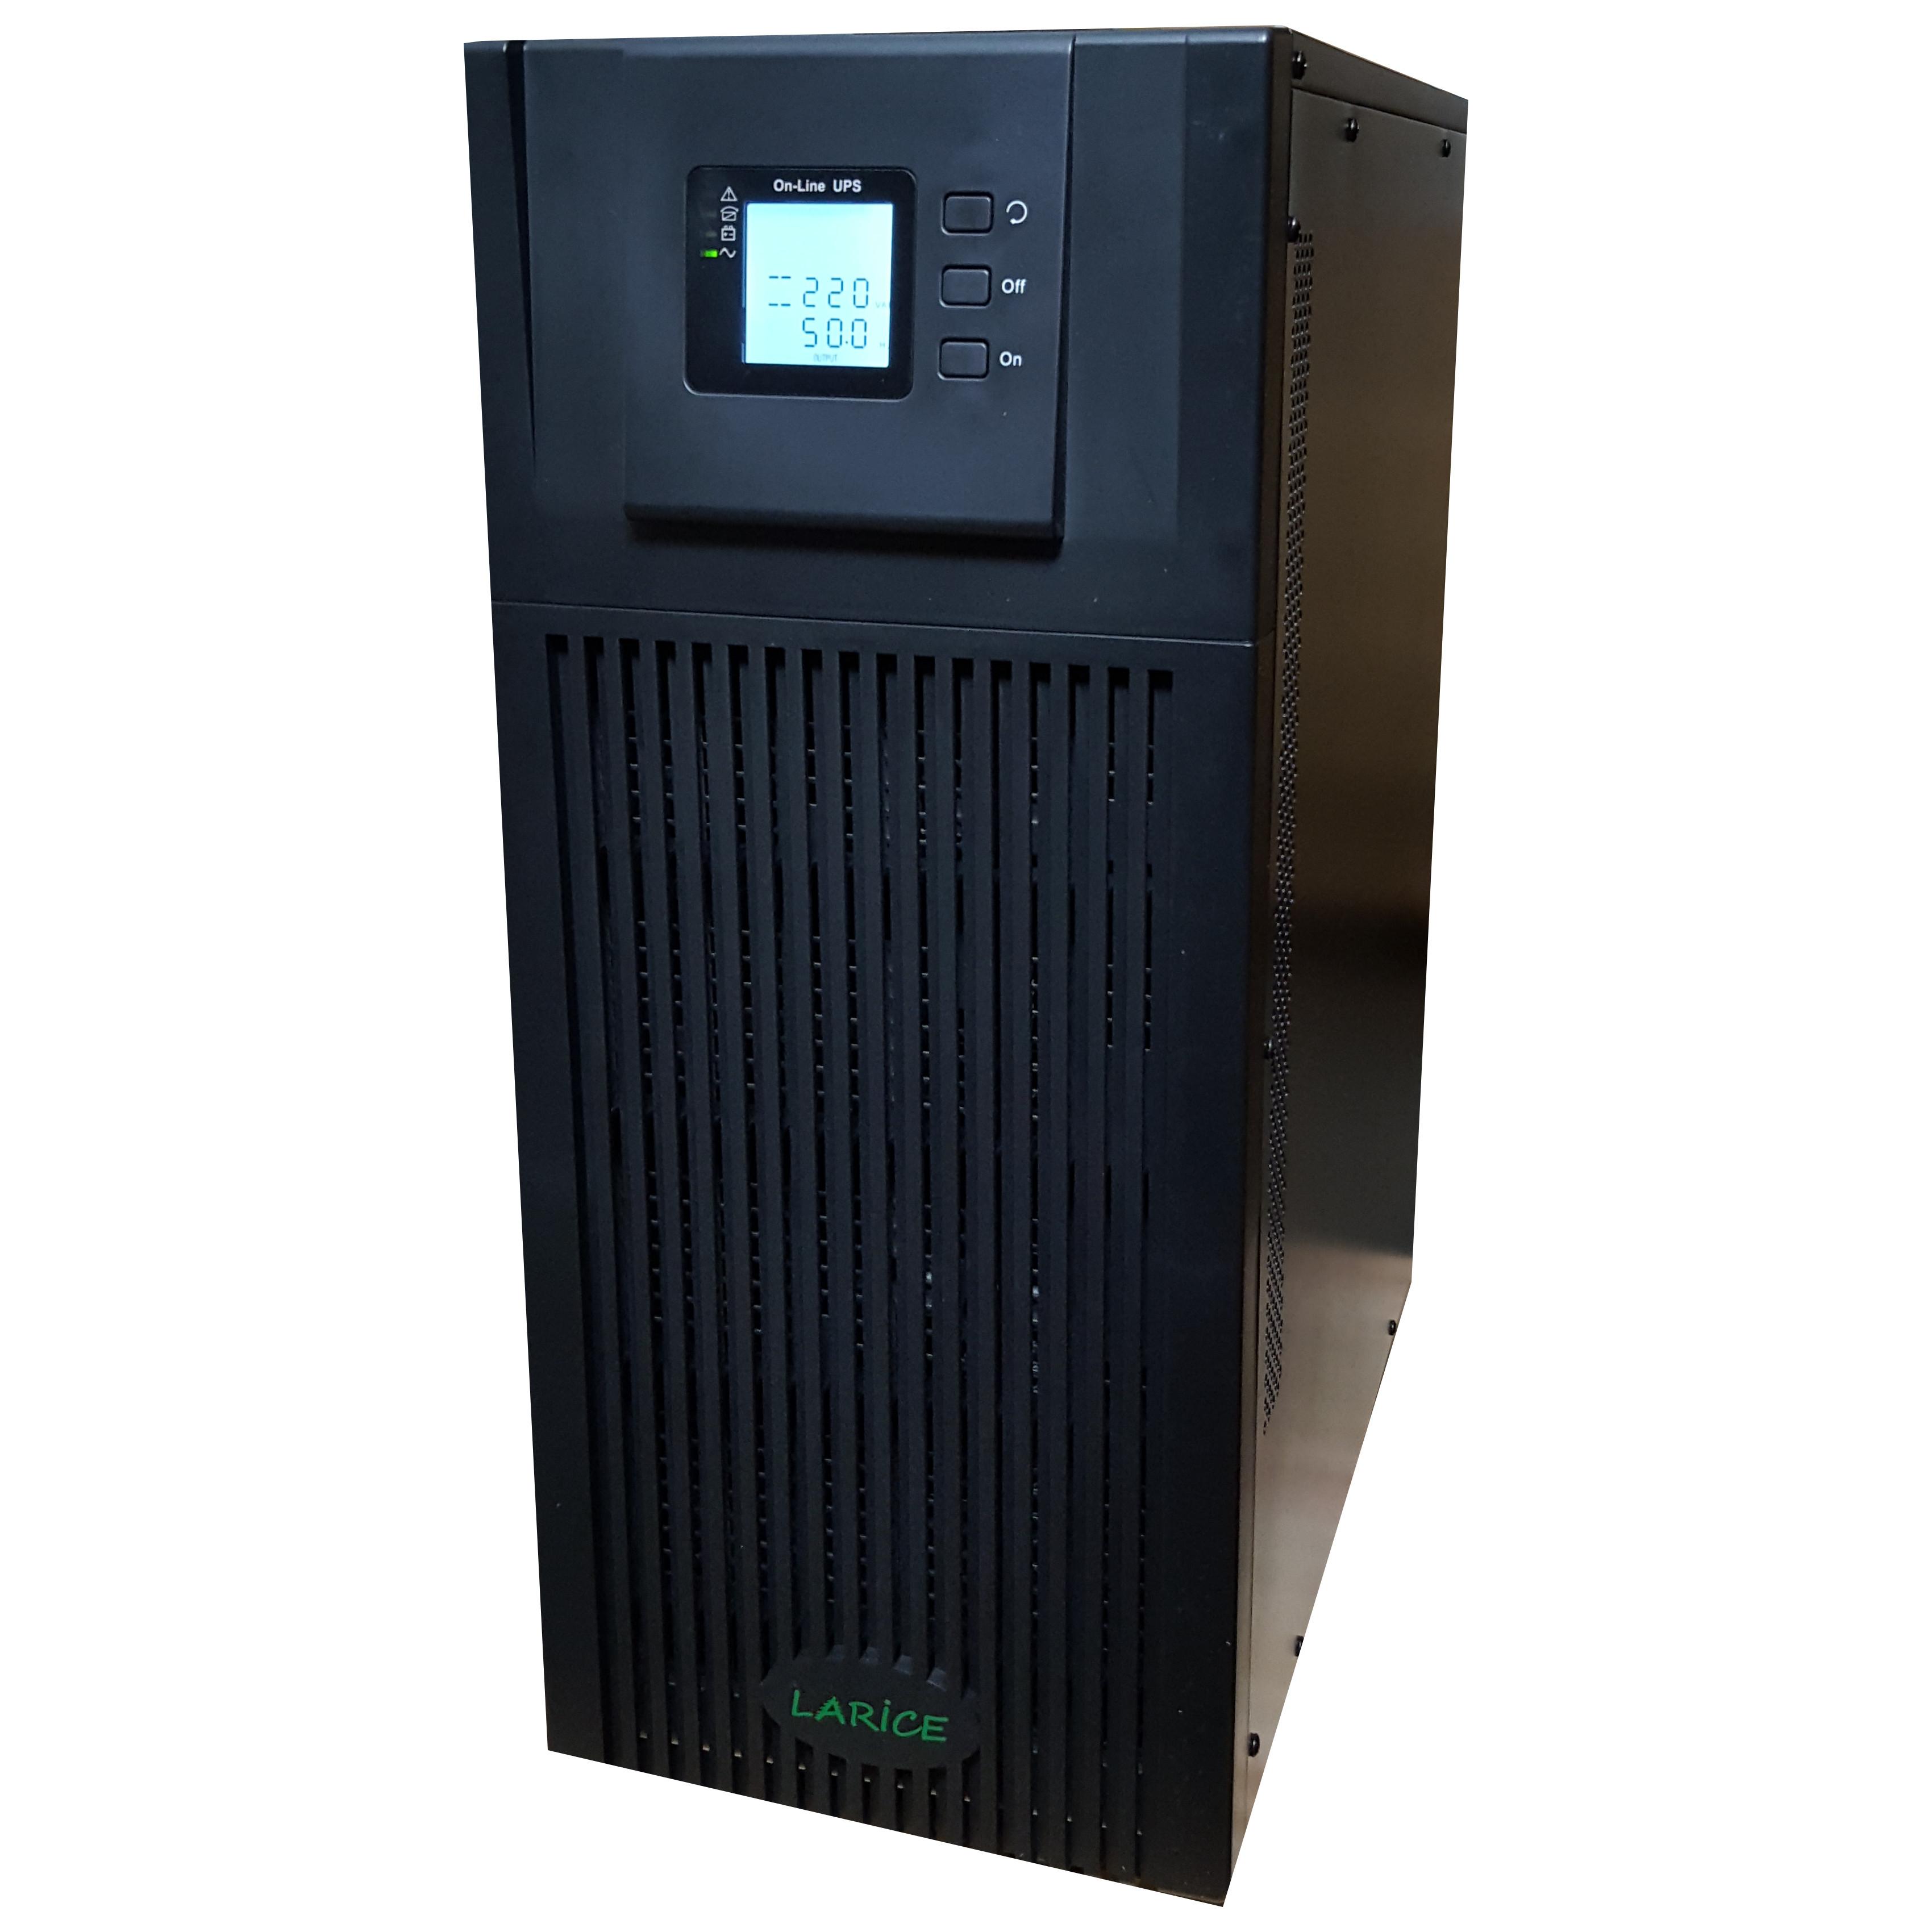 UPS LARICE Online Tower 6000VA/5400W, 20 x 9Ah | LARICE | MP S 6KVA-20